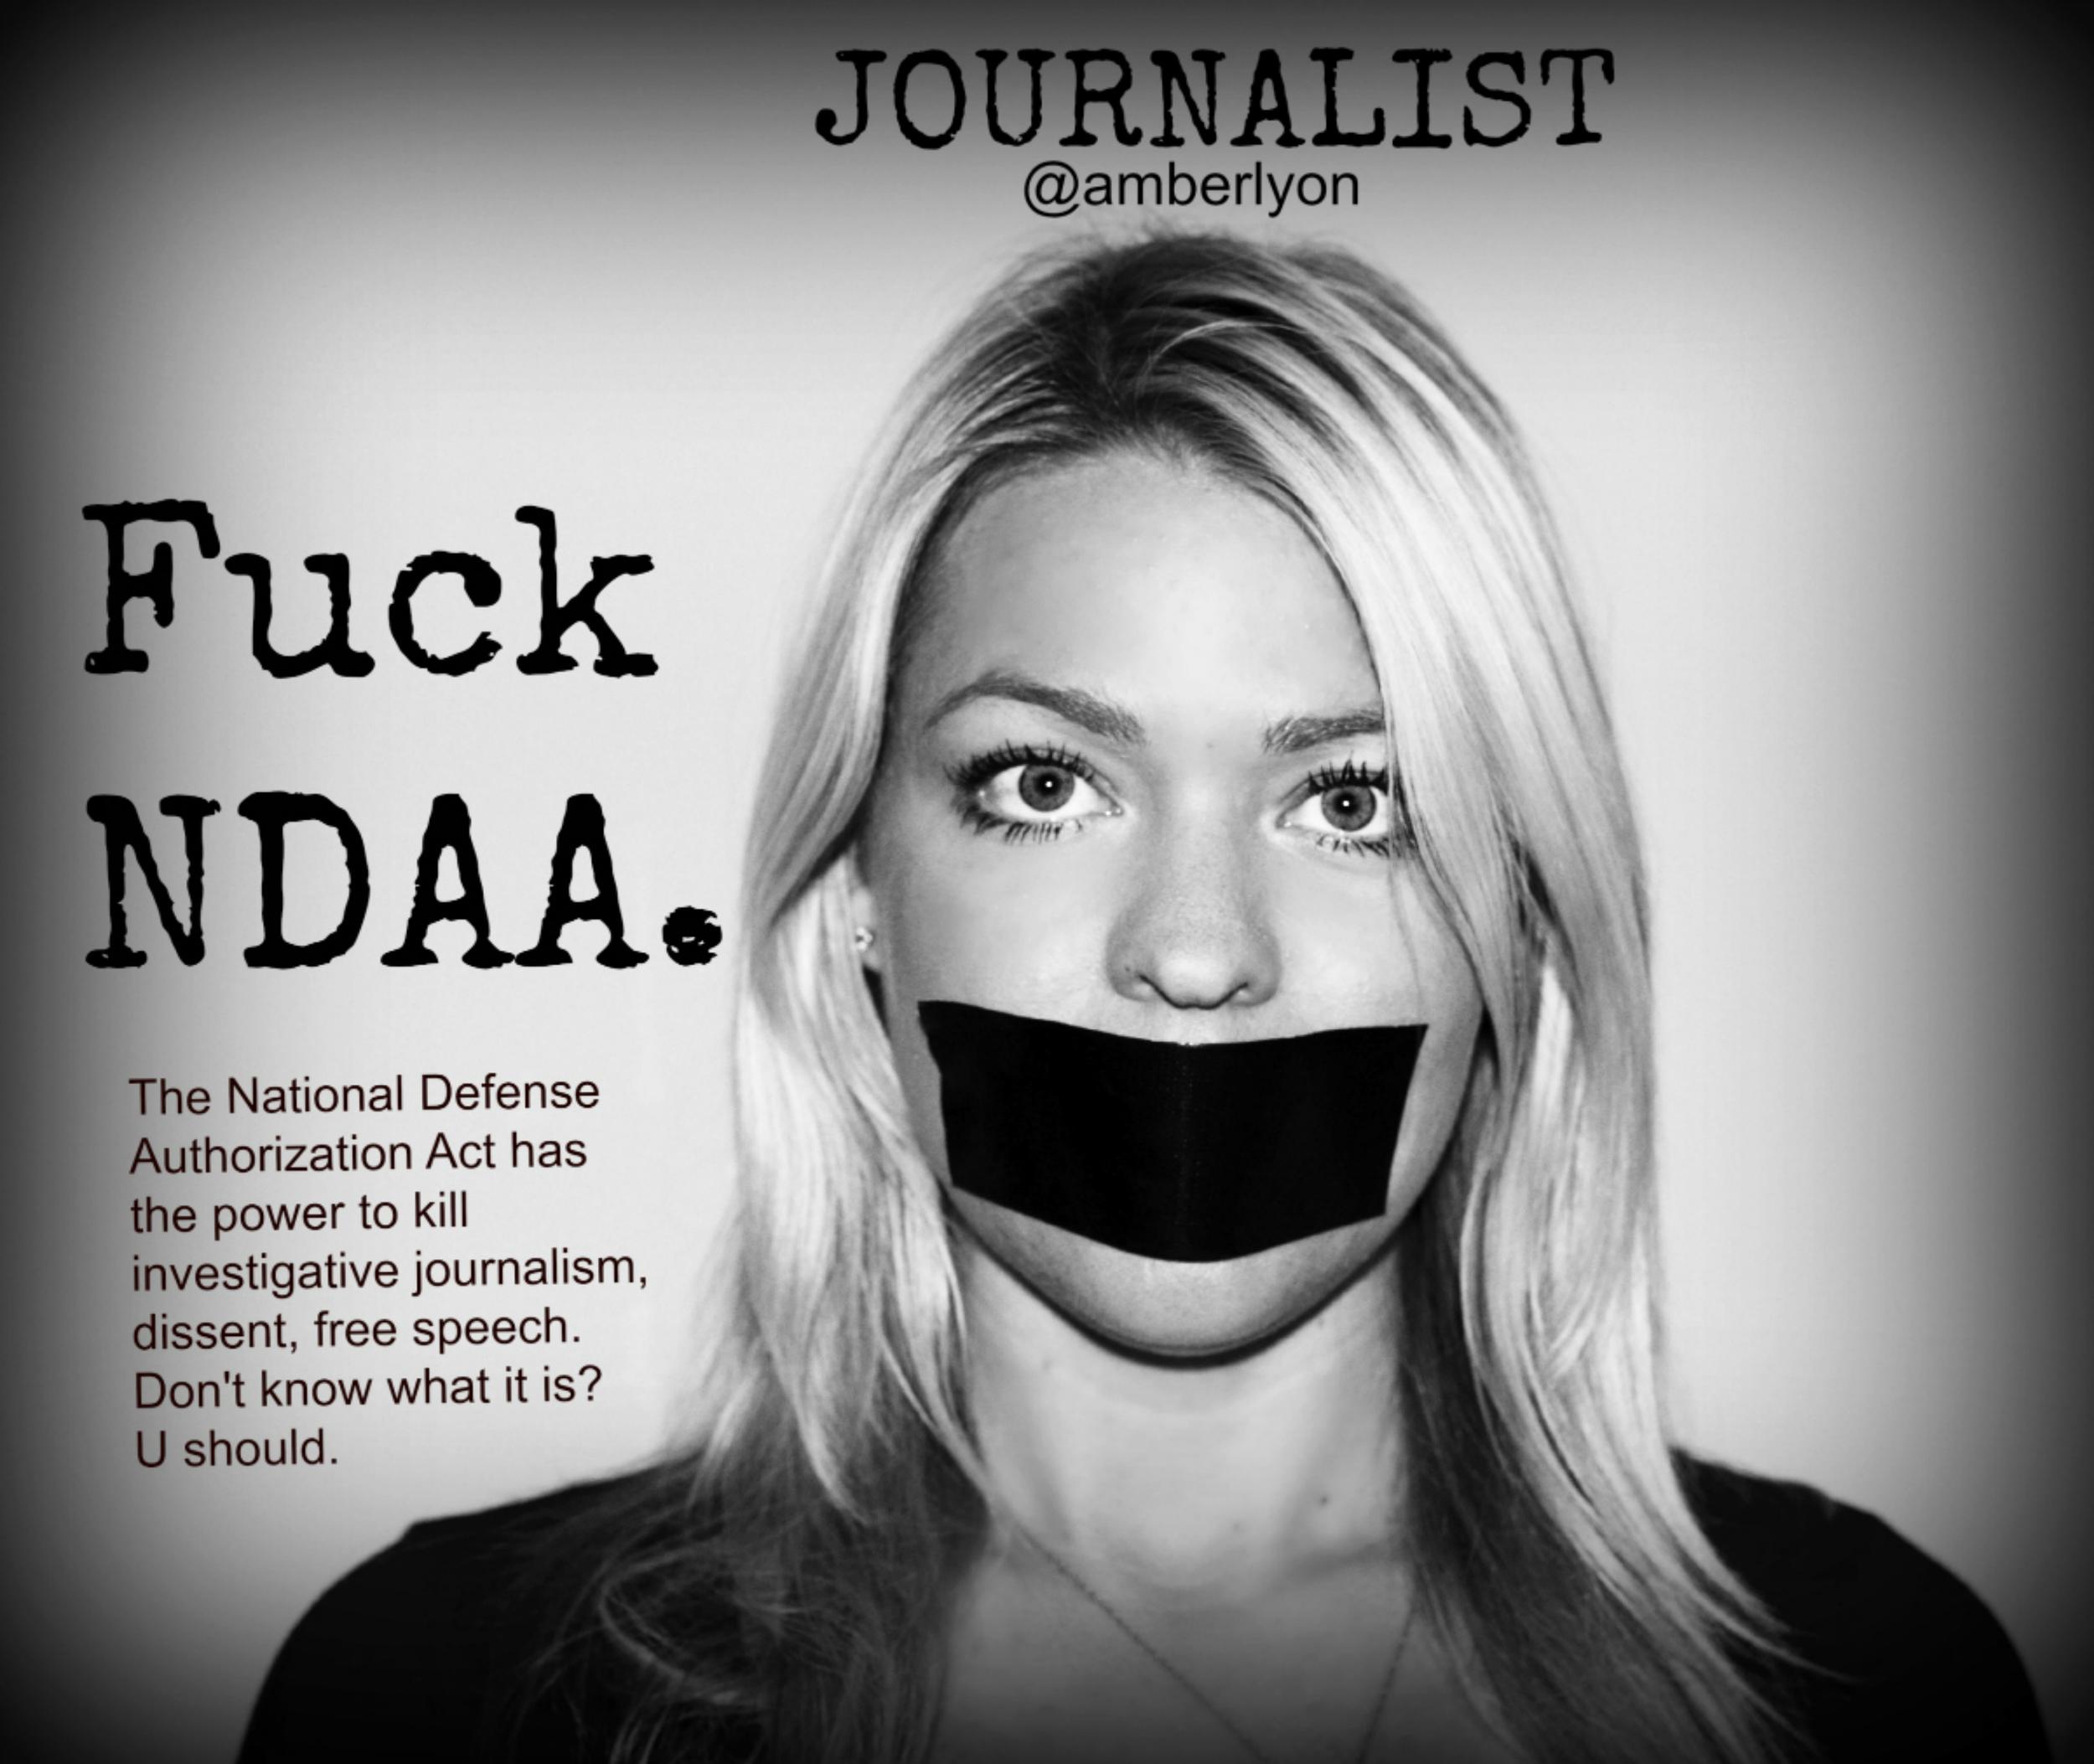 Fuck the NDAA